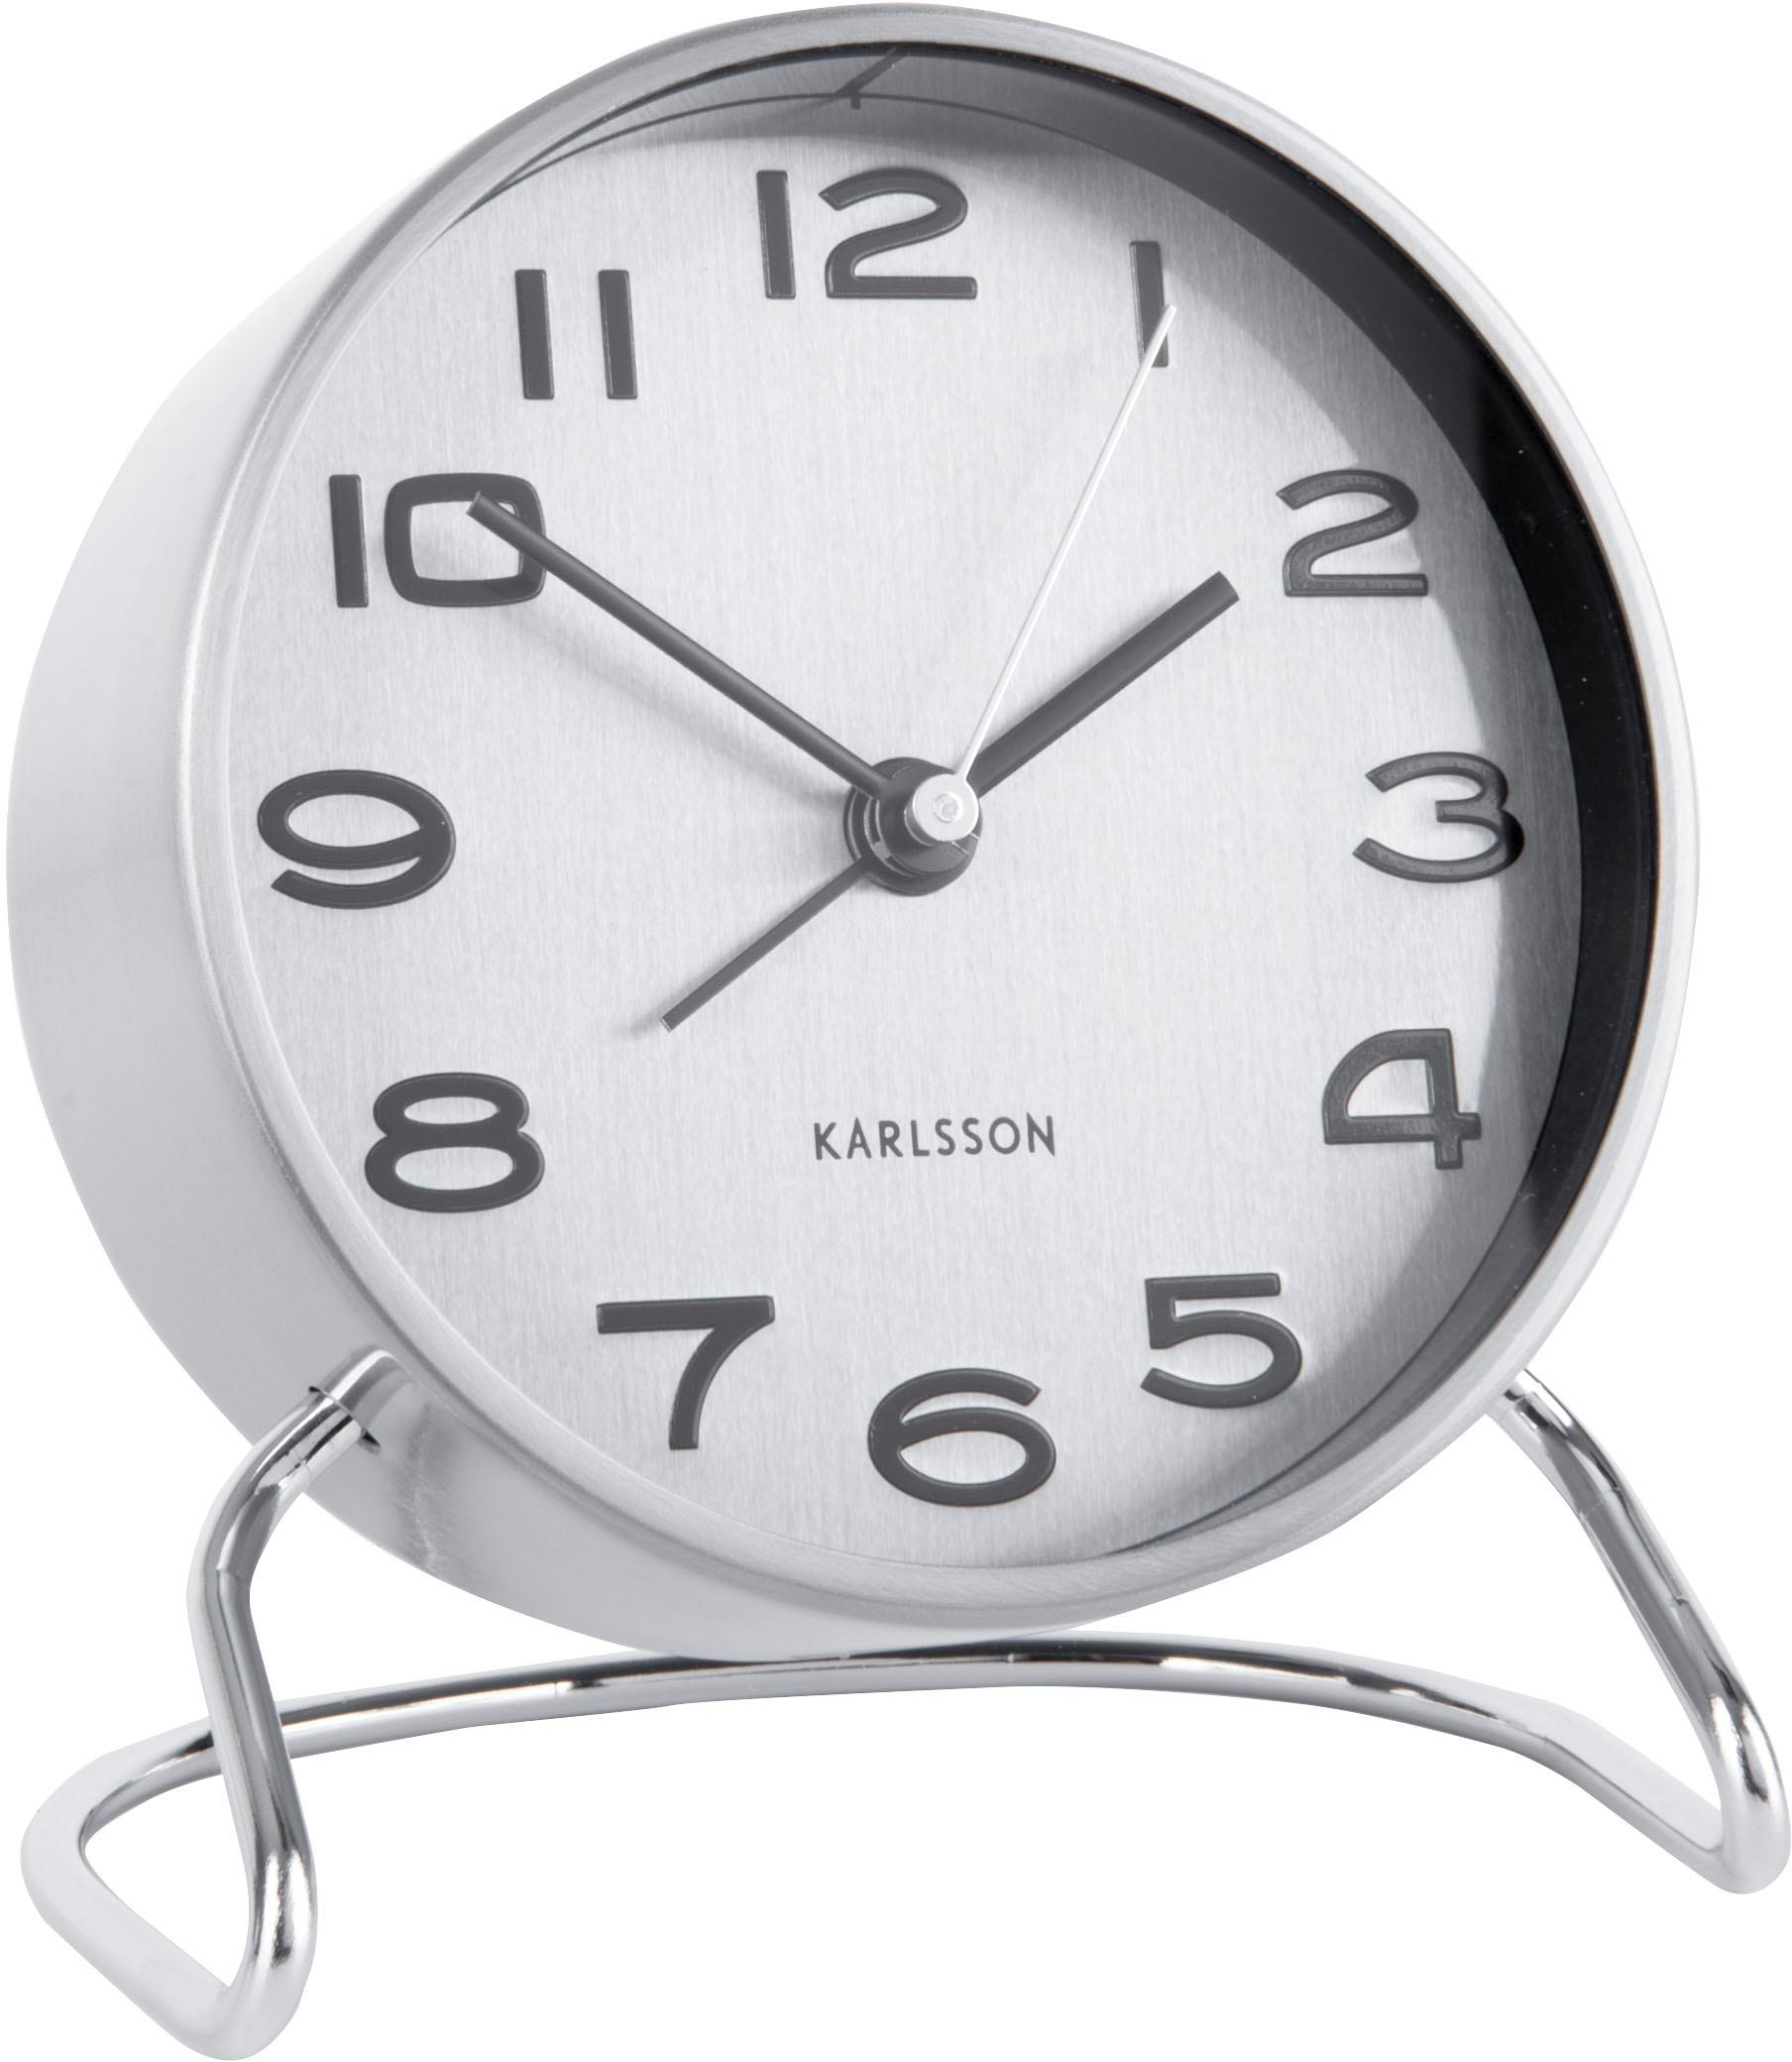 Despertador Classical, Metal recubierto, Cromo, blanco, negro, Ø 10 cm